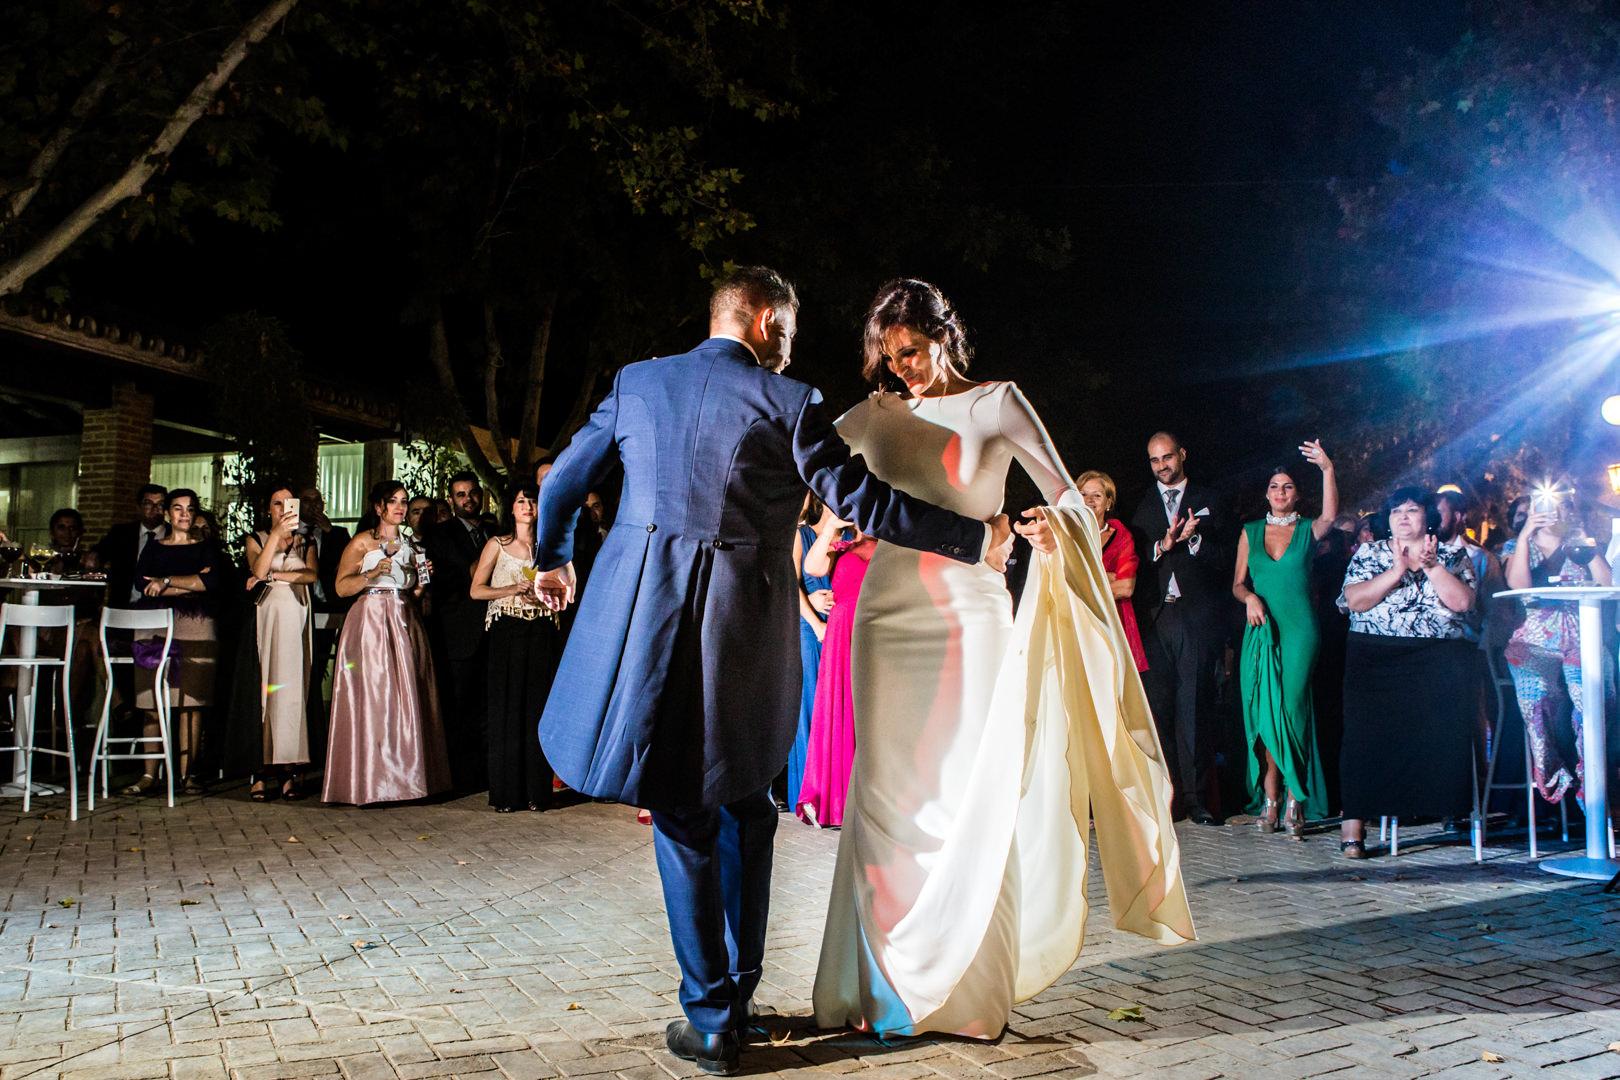 Boda-Irene-Marcos-Dos-Hermanas-Finca-Clotidle-engagement-Rafael-Torres-fotografo-bodas-sevilla-madrid-barcelona-wedding-photographer--35.jpg